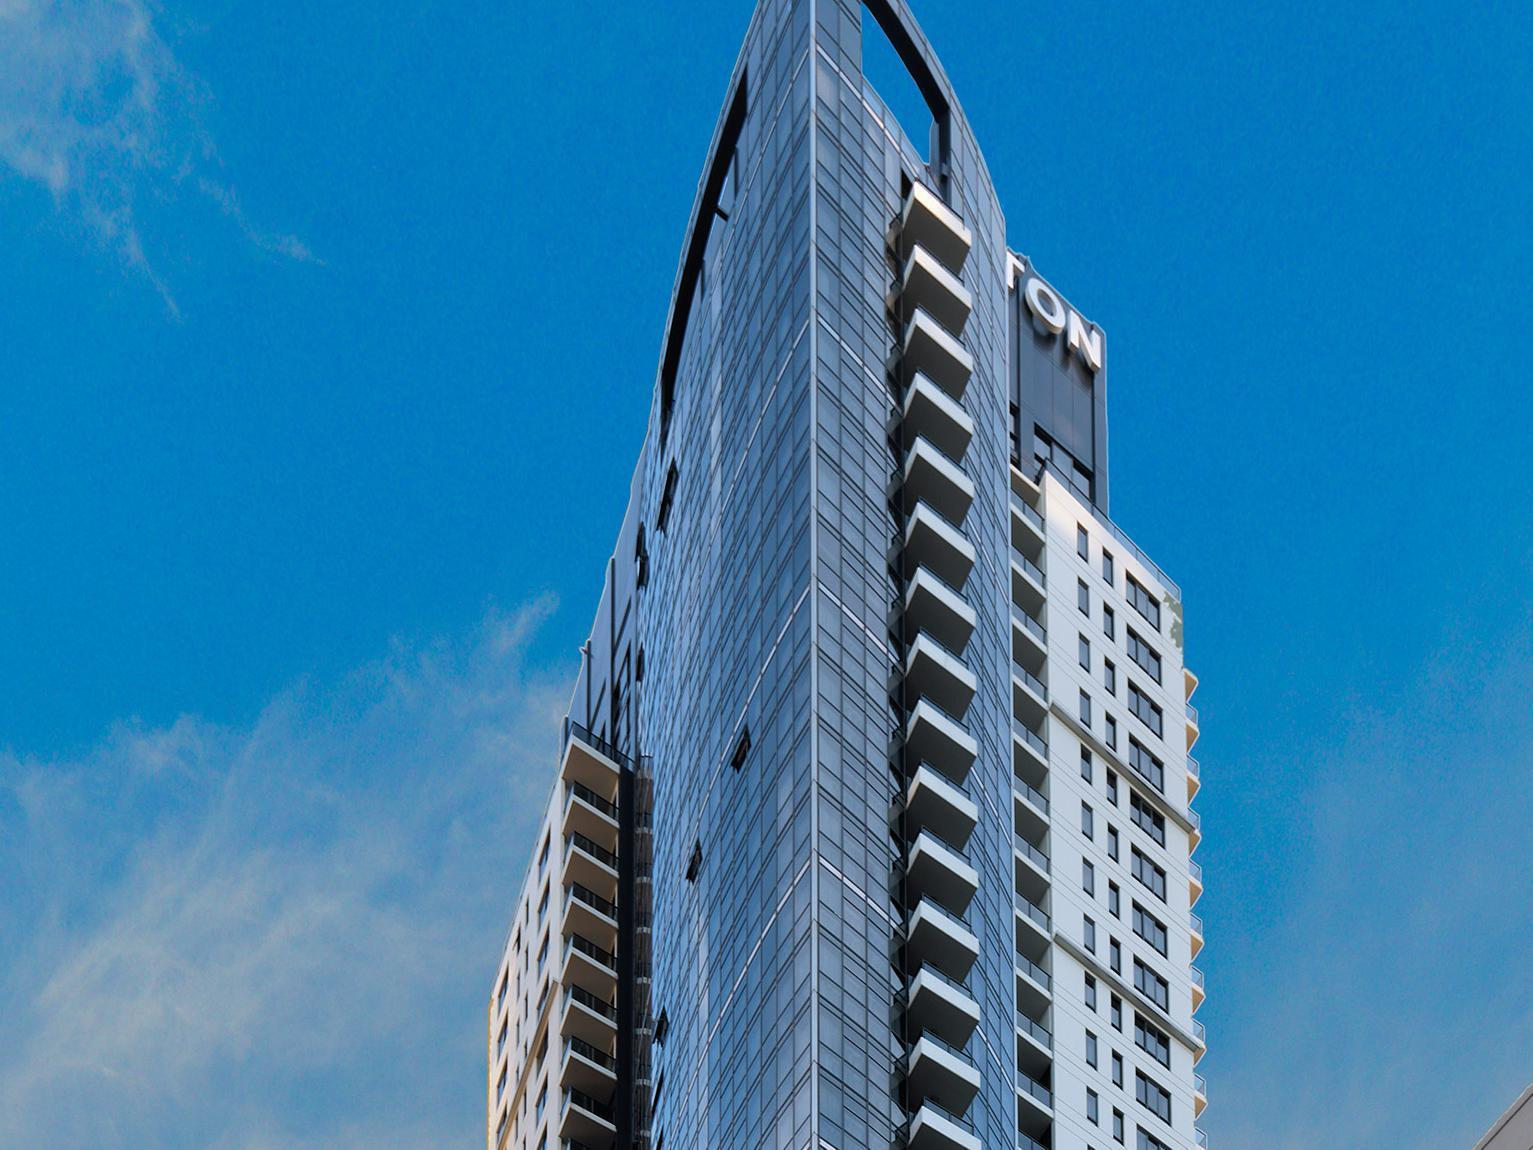 Australia Hotel Accommodation Cheap | Exterior